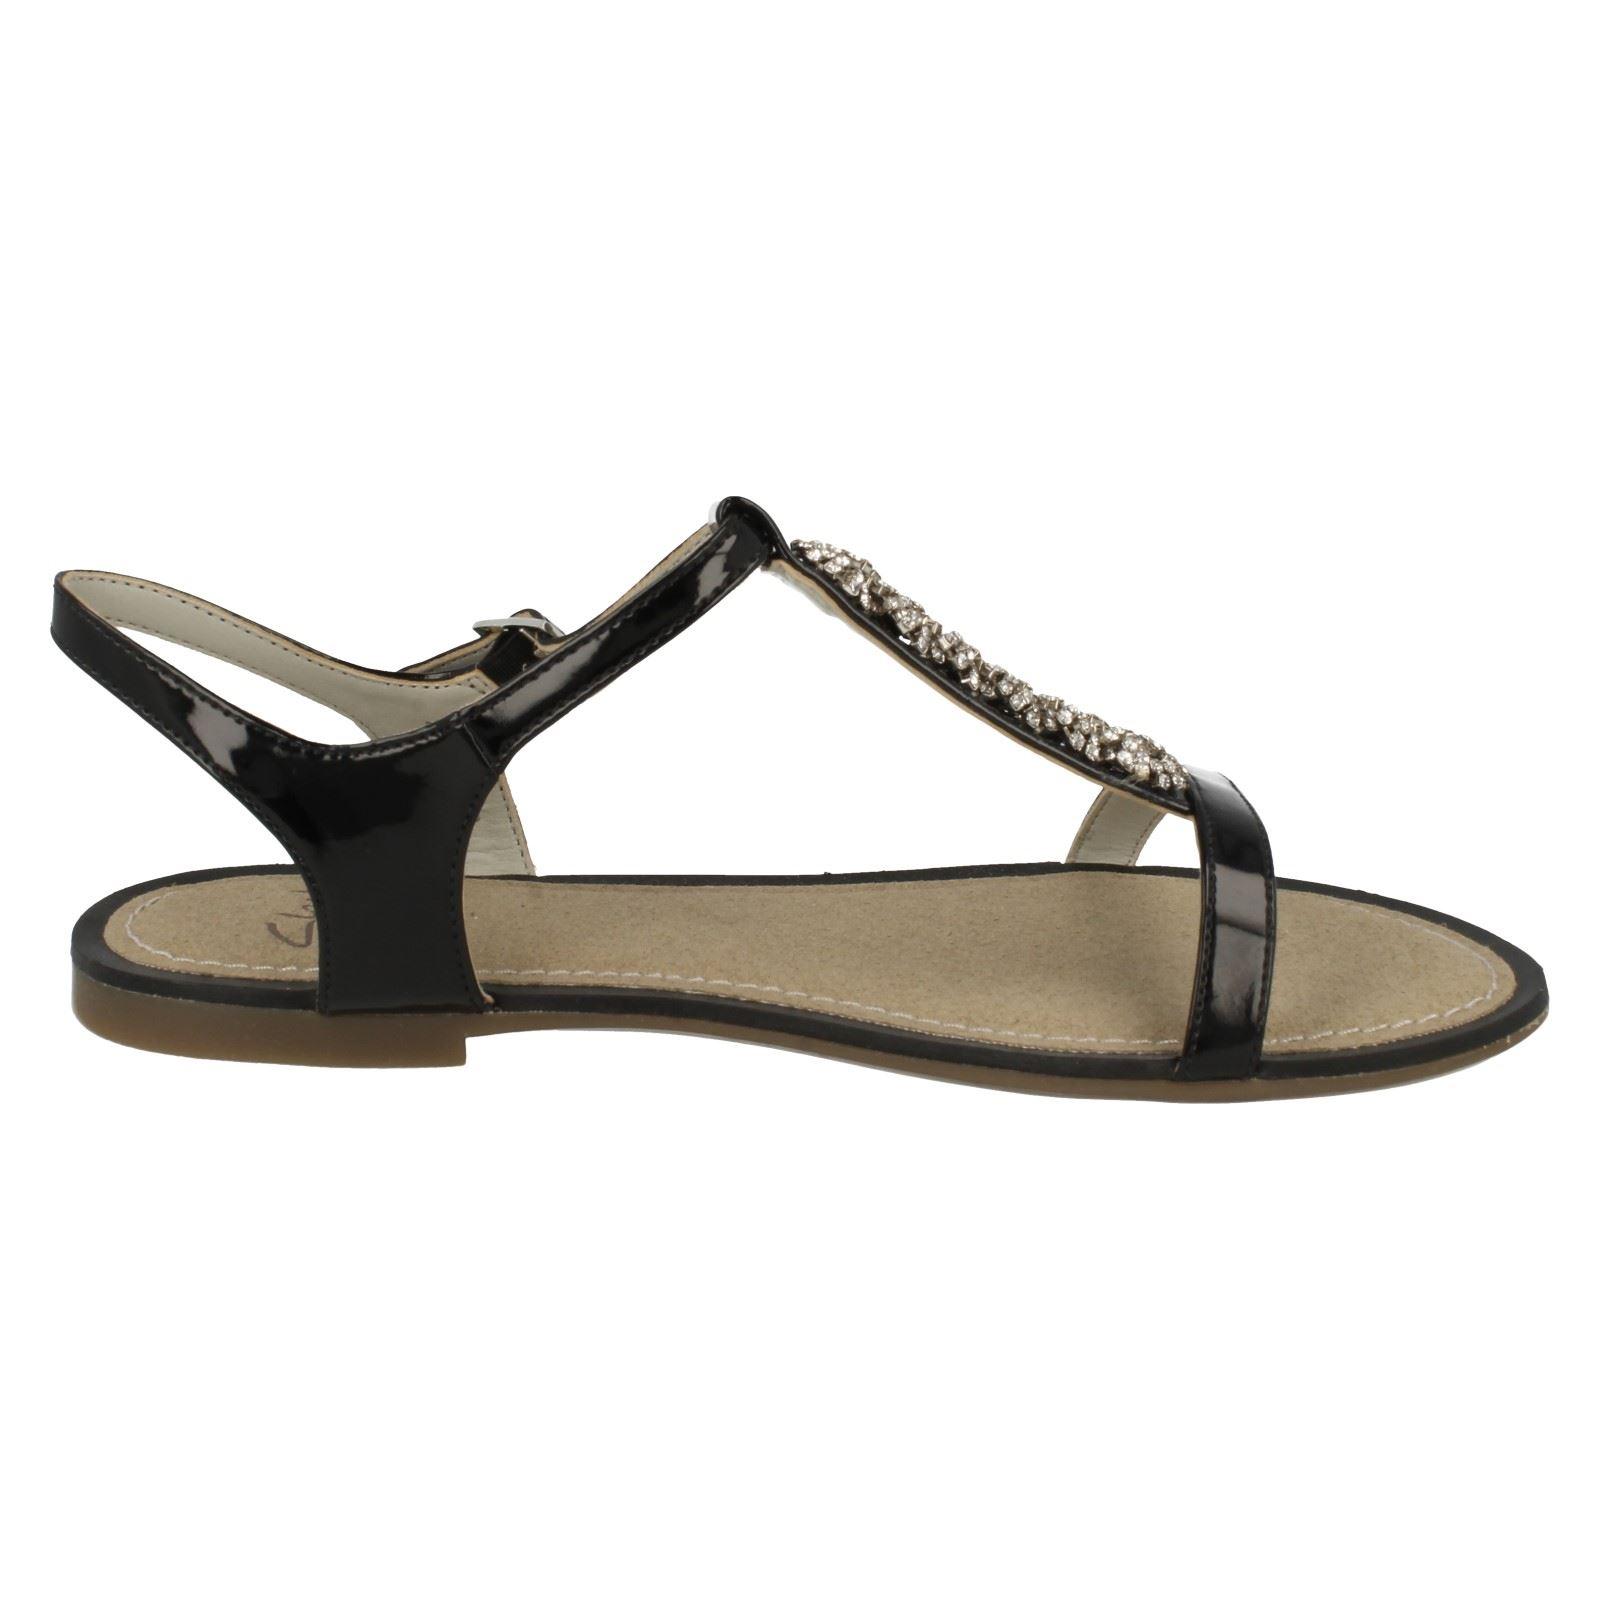 Ladies Clarks Sandals Sail Cruise Ebay